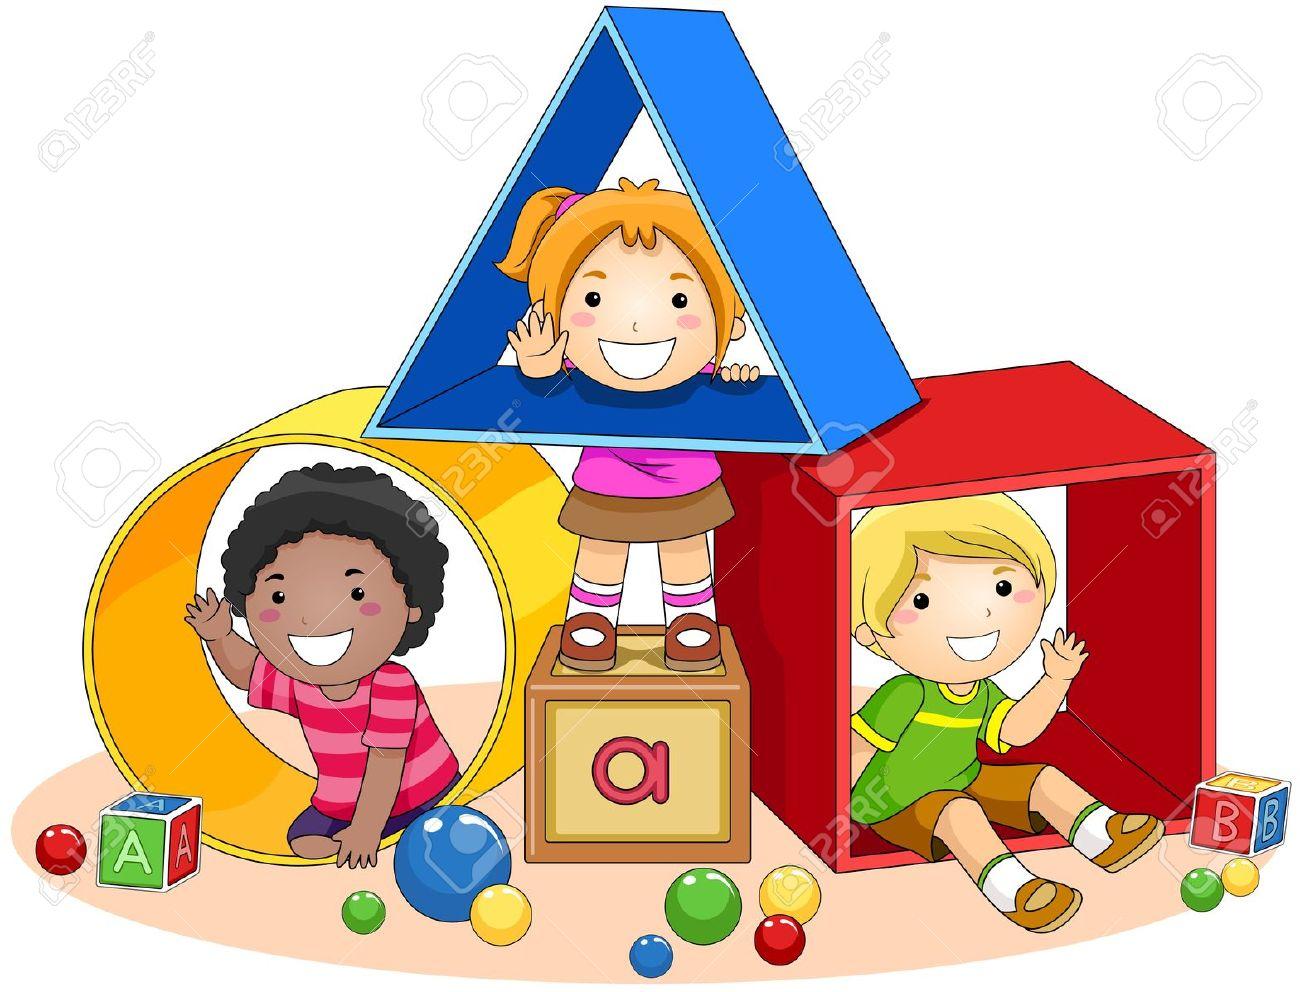 school play School free play clipart jpg.